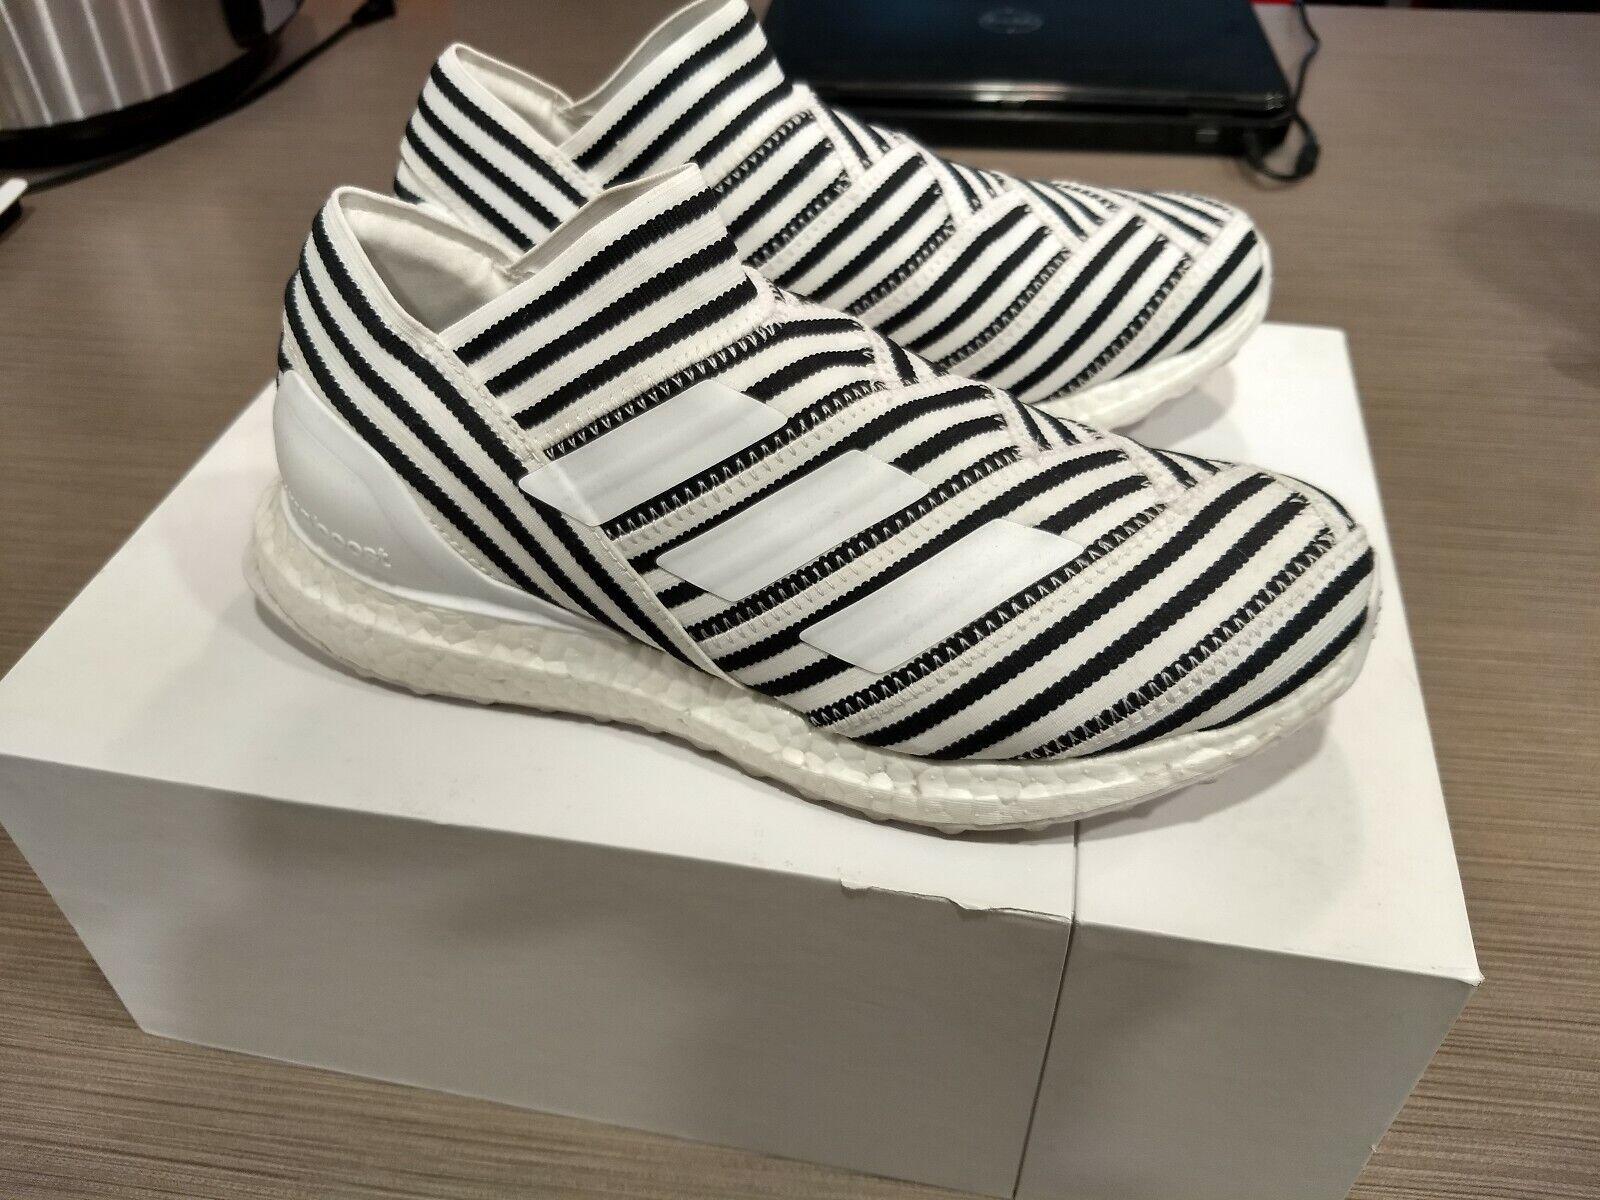 Adidas Nemeziz Tango 17+ Ultraboost zebra black white SZ 7